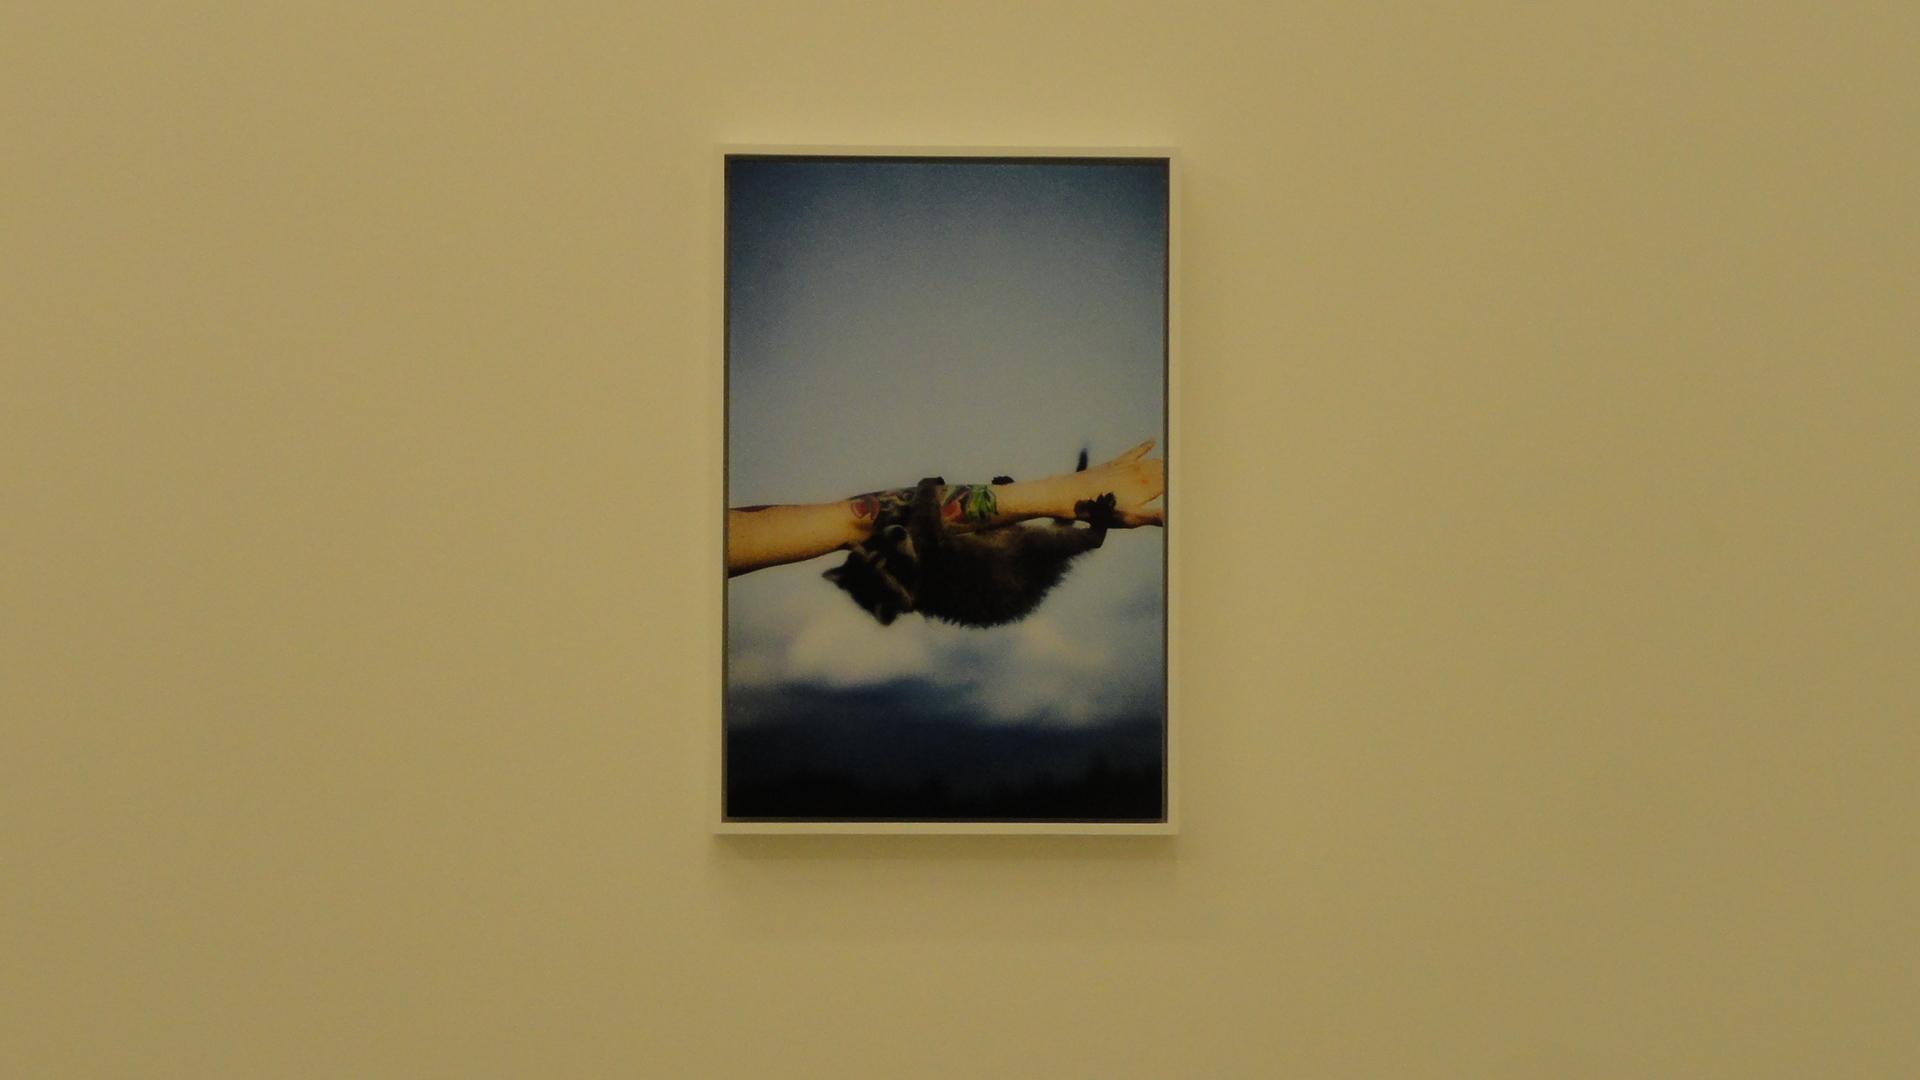 Galerie Perrotin - Ryan McGinley, Body Loud